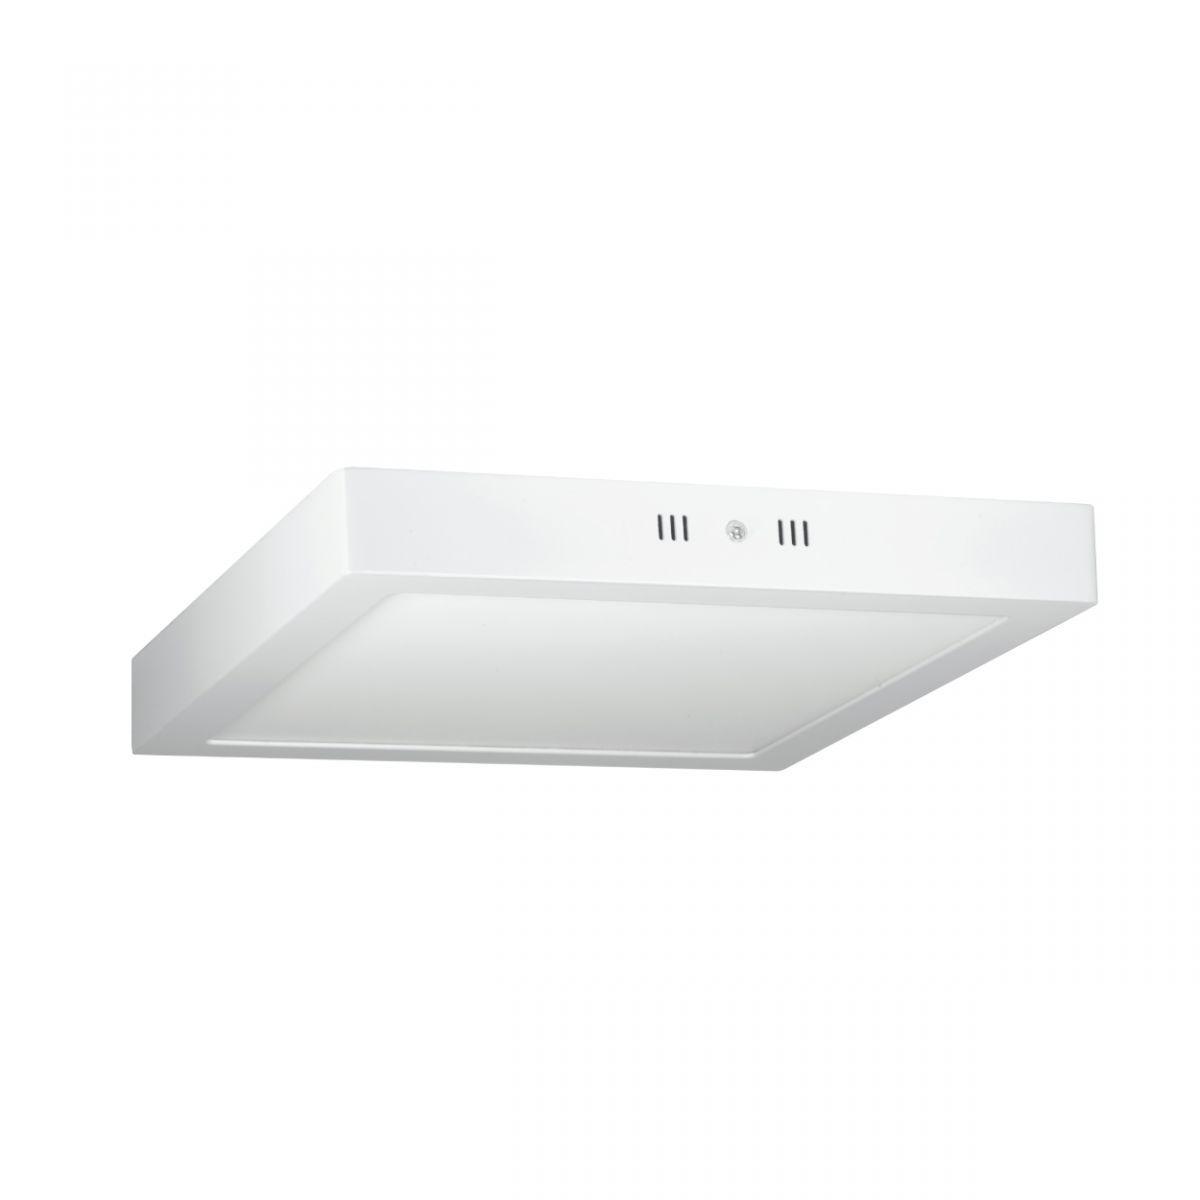 Luminária Plafon LED 24w Sobrepor Branco Frio Redonda - Luxtek